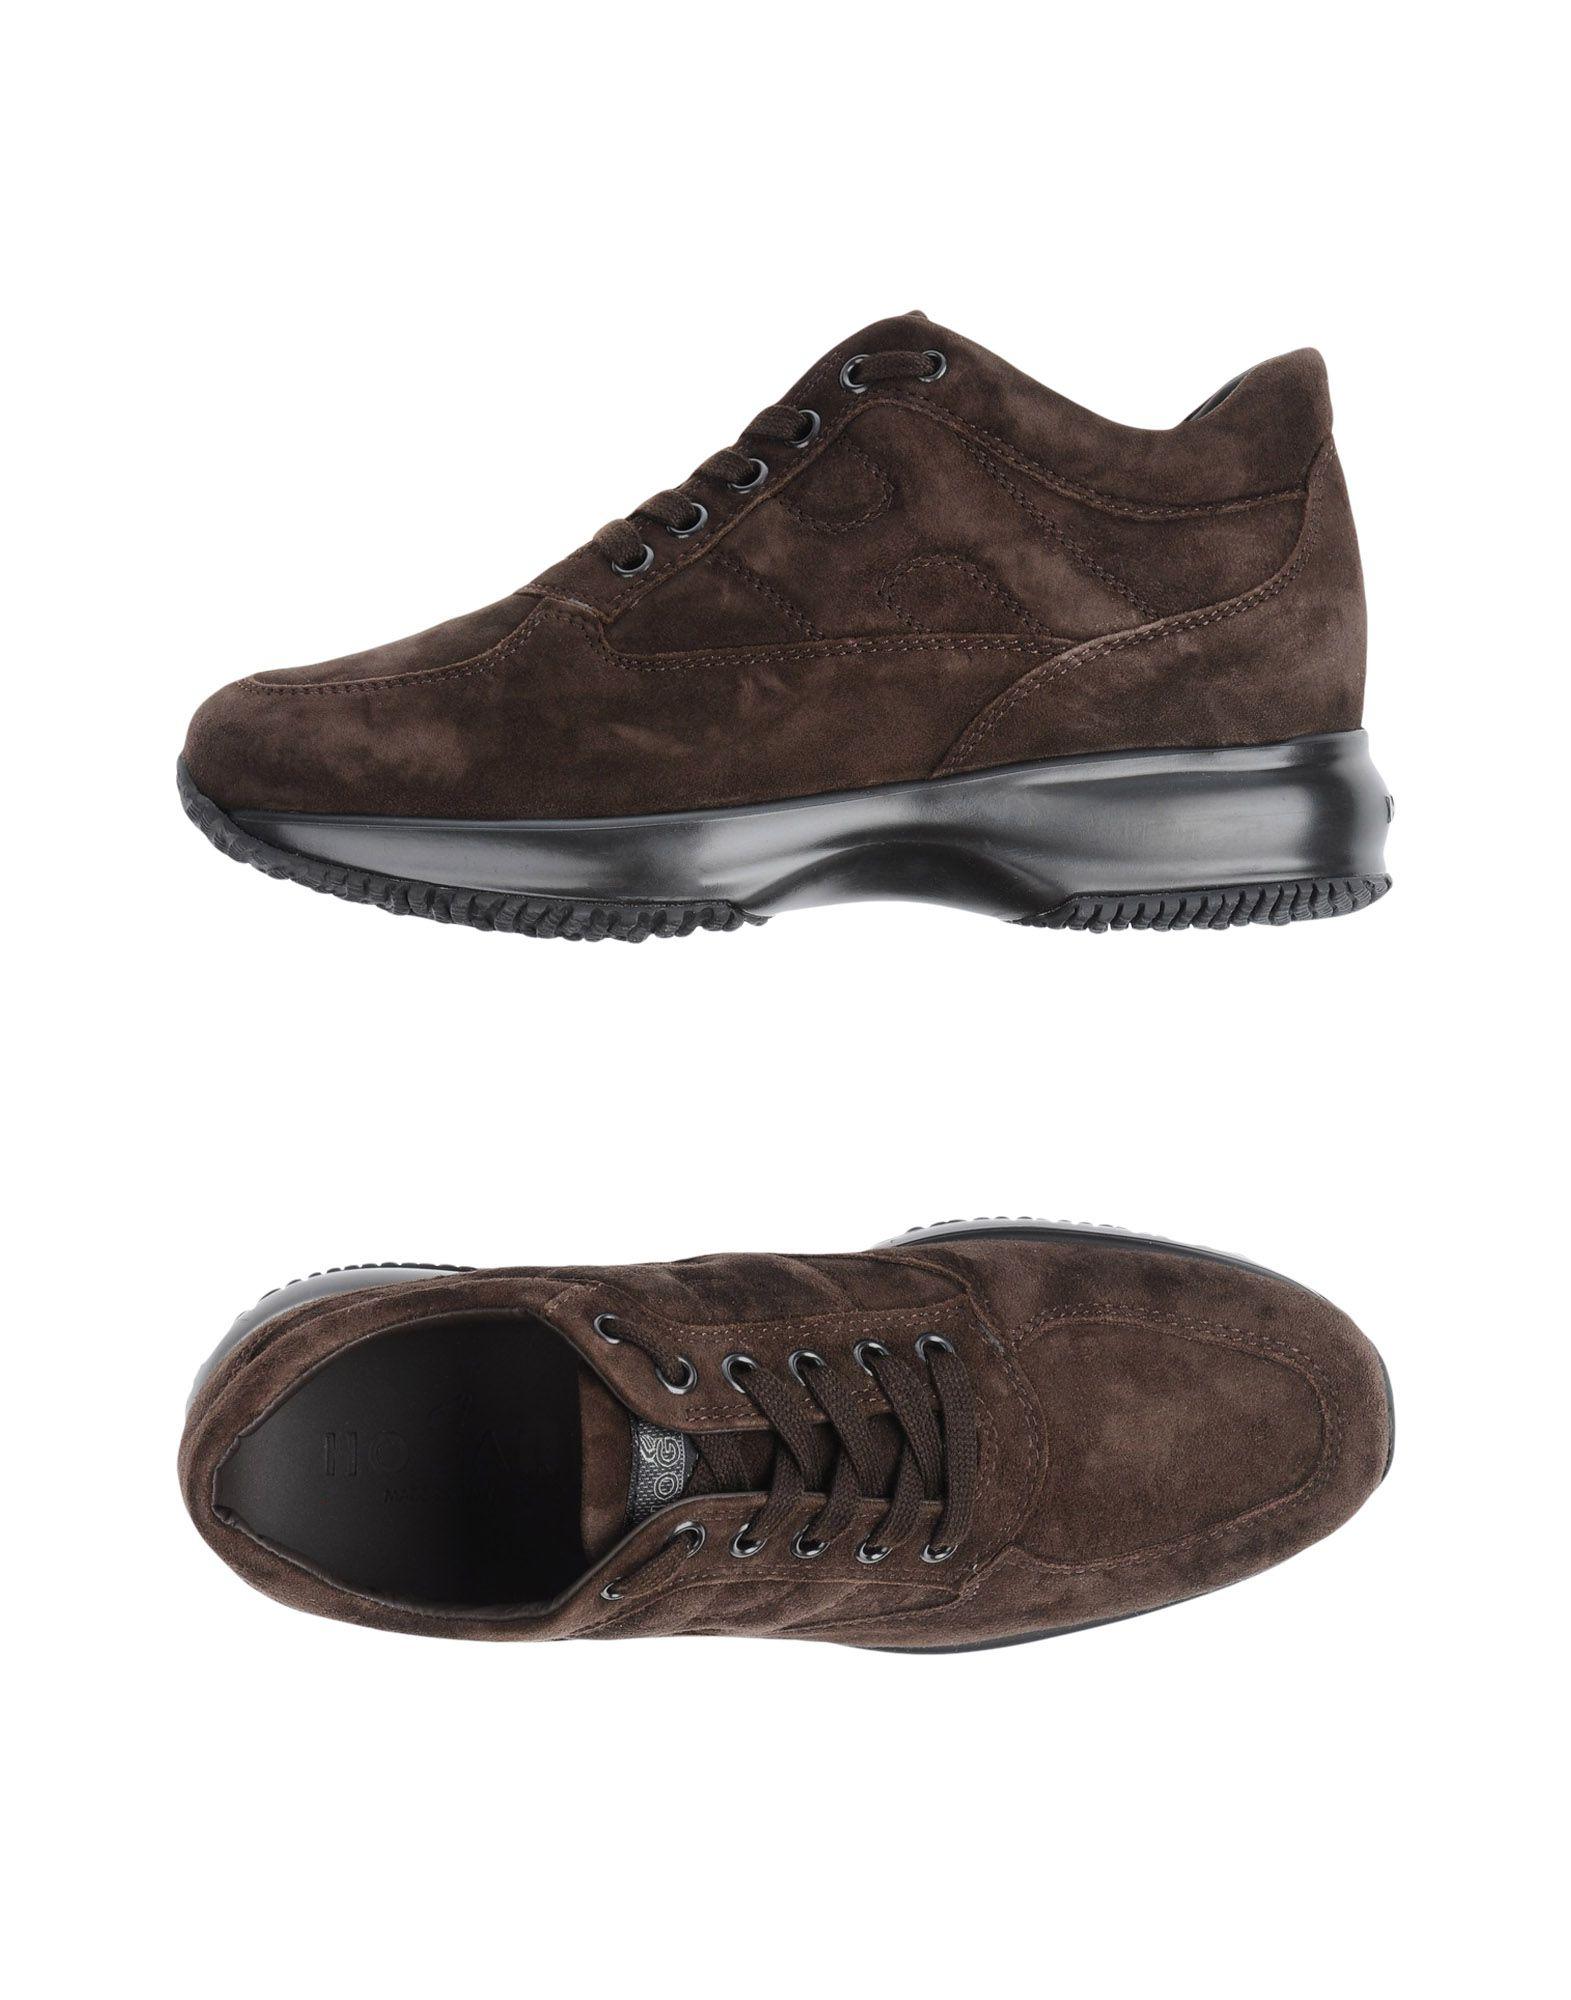 Moda Sneakers Hogan Donna Donna Hogan - 11214611LU 644fea